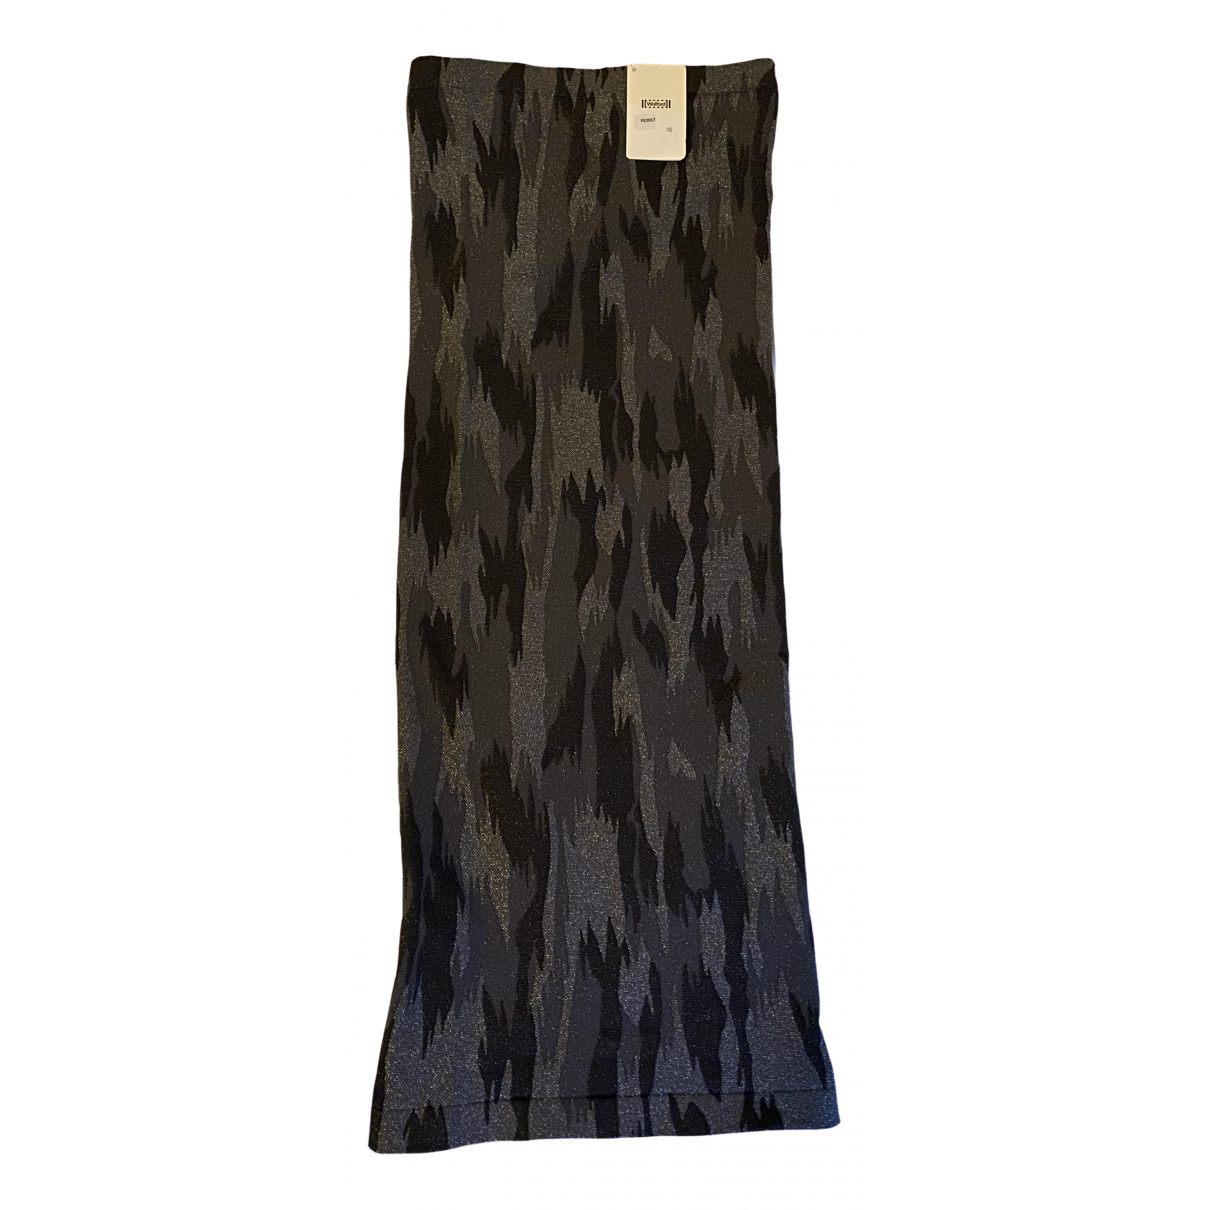 Wolford \N Grey dress for Women S International